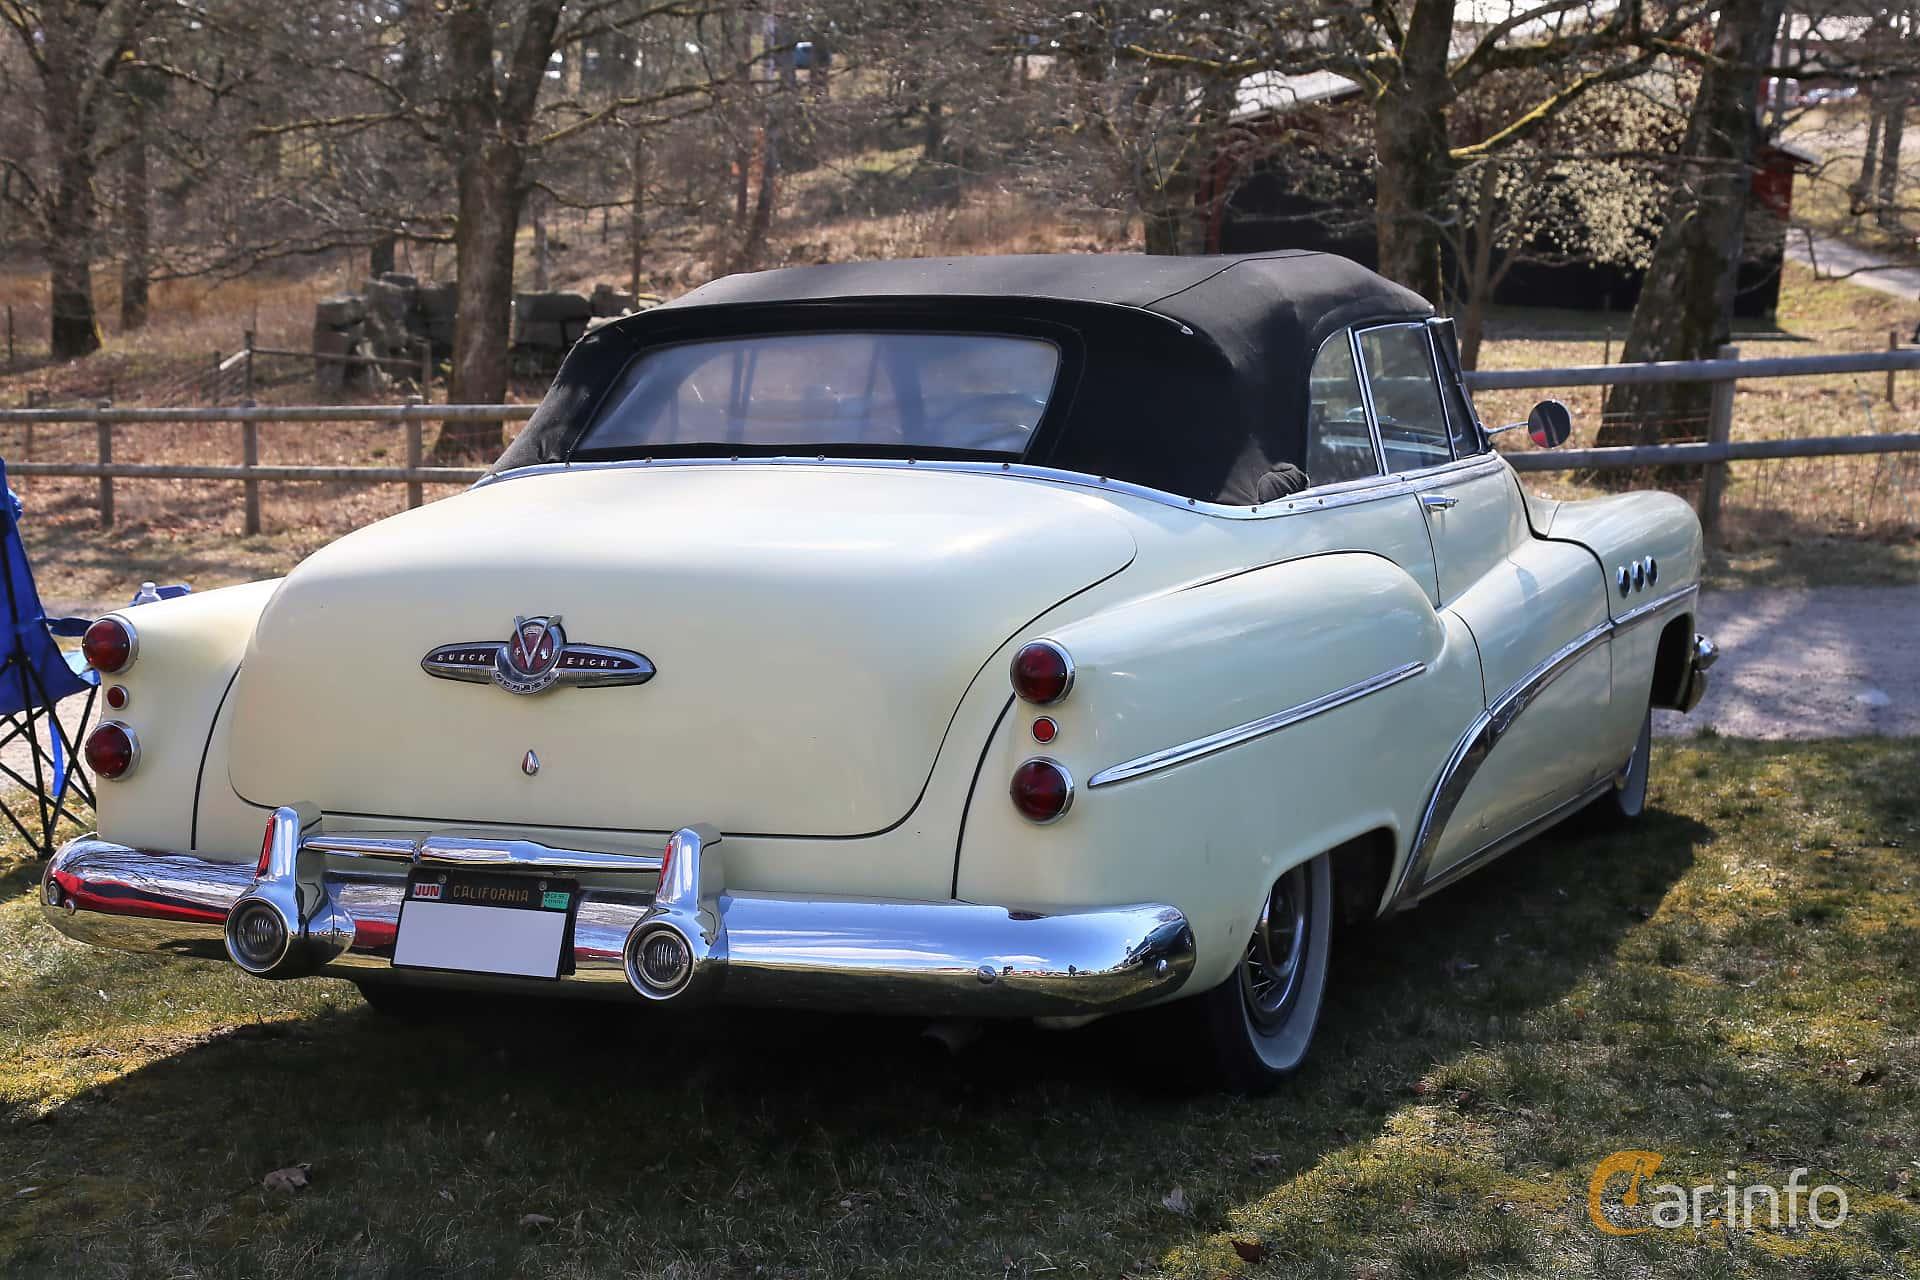 Buick Super Convertible 5.3 V8 Automatic, 172hp, 1953 at Uddevalla Veteranbilsmarknad Backamo, Ljungsk 2019